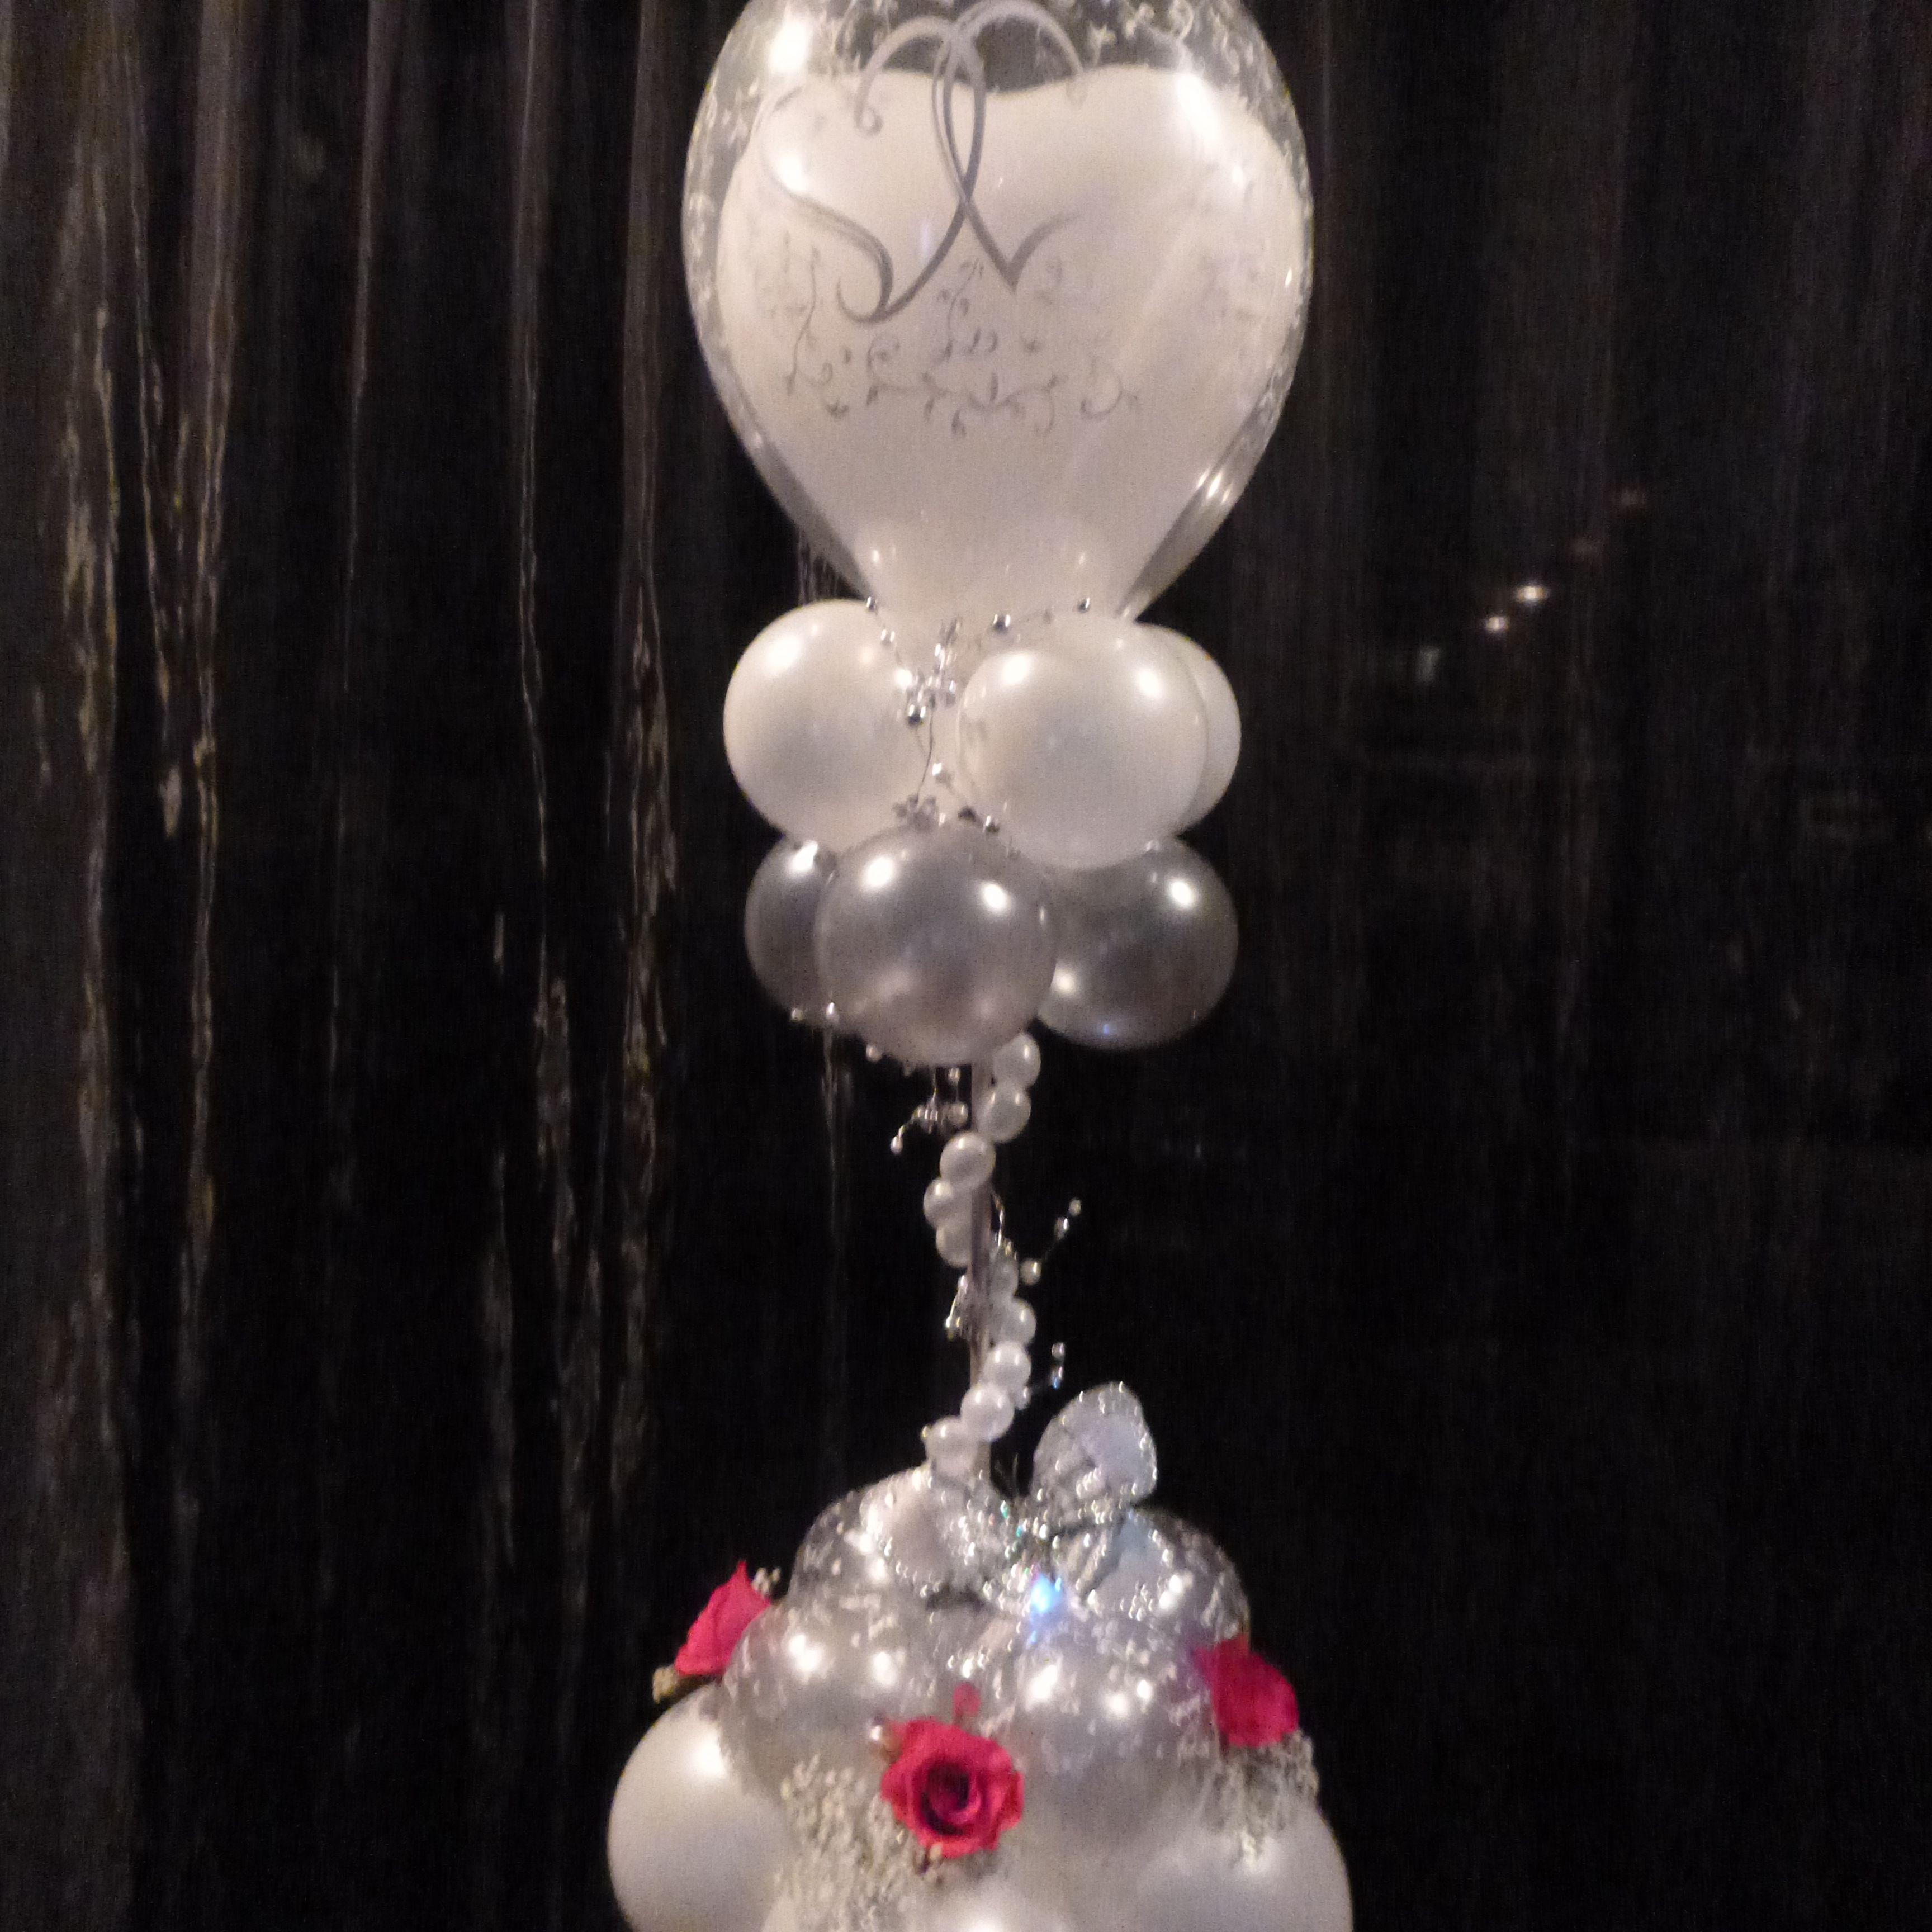 Balloon Wedding Decorations Ideas: Wedding Balloons Decorations